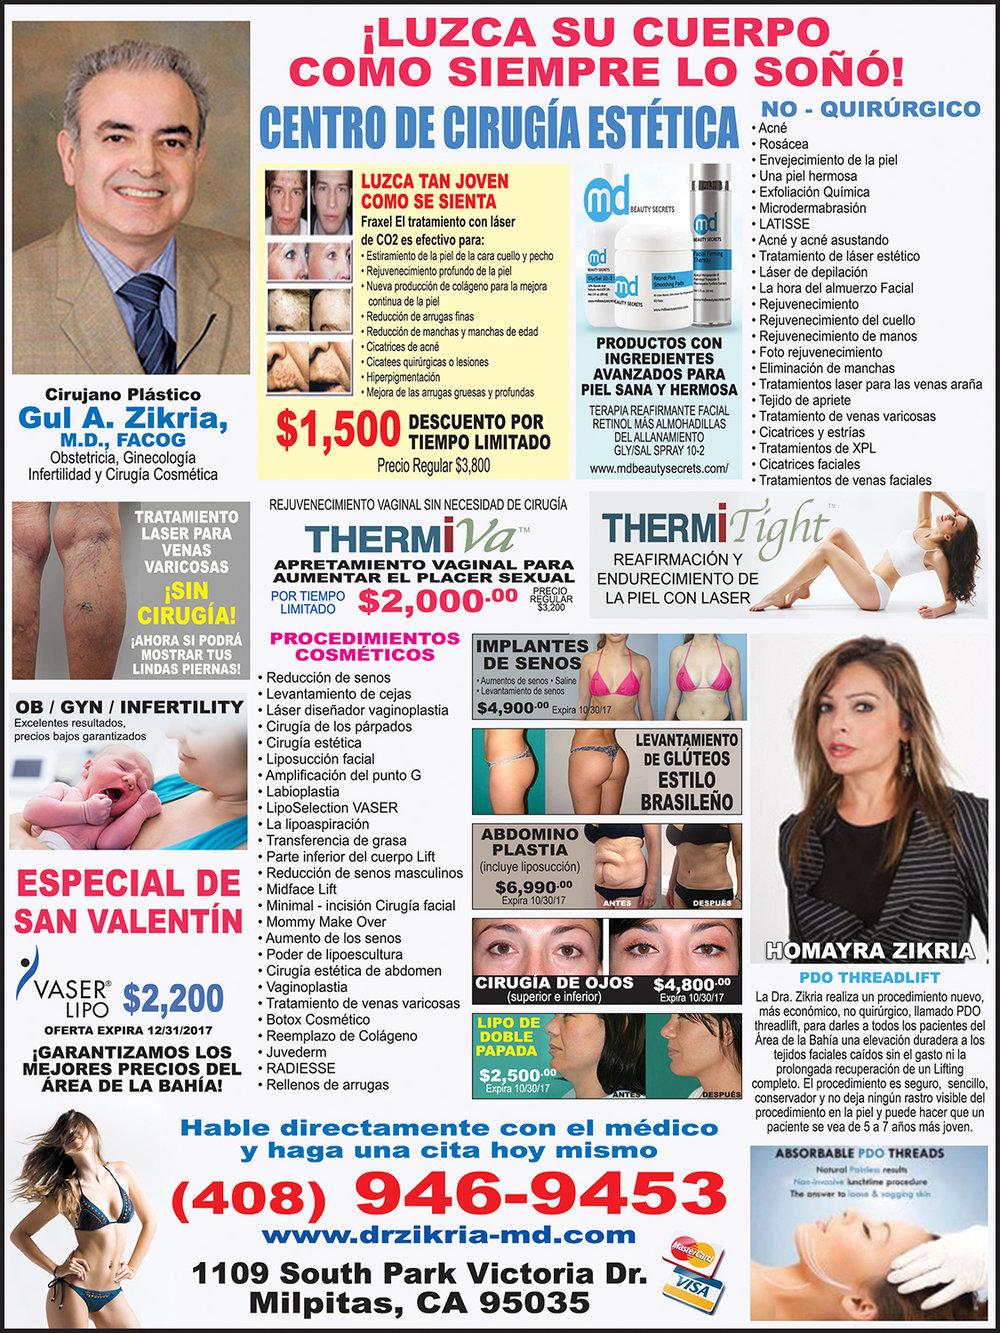 Cosmetic Surgery Center - Gul A Zikria MD 1 Pag -  FEBRERO 2018.jpg